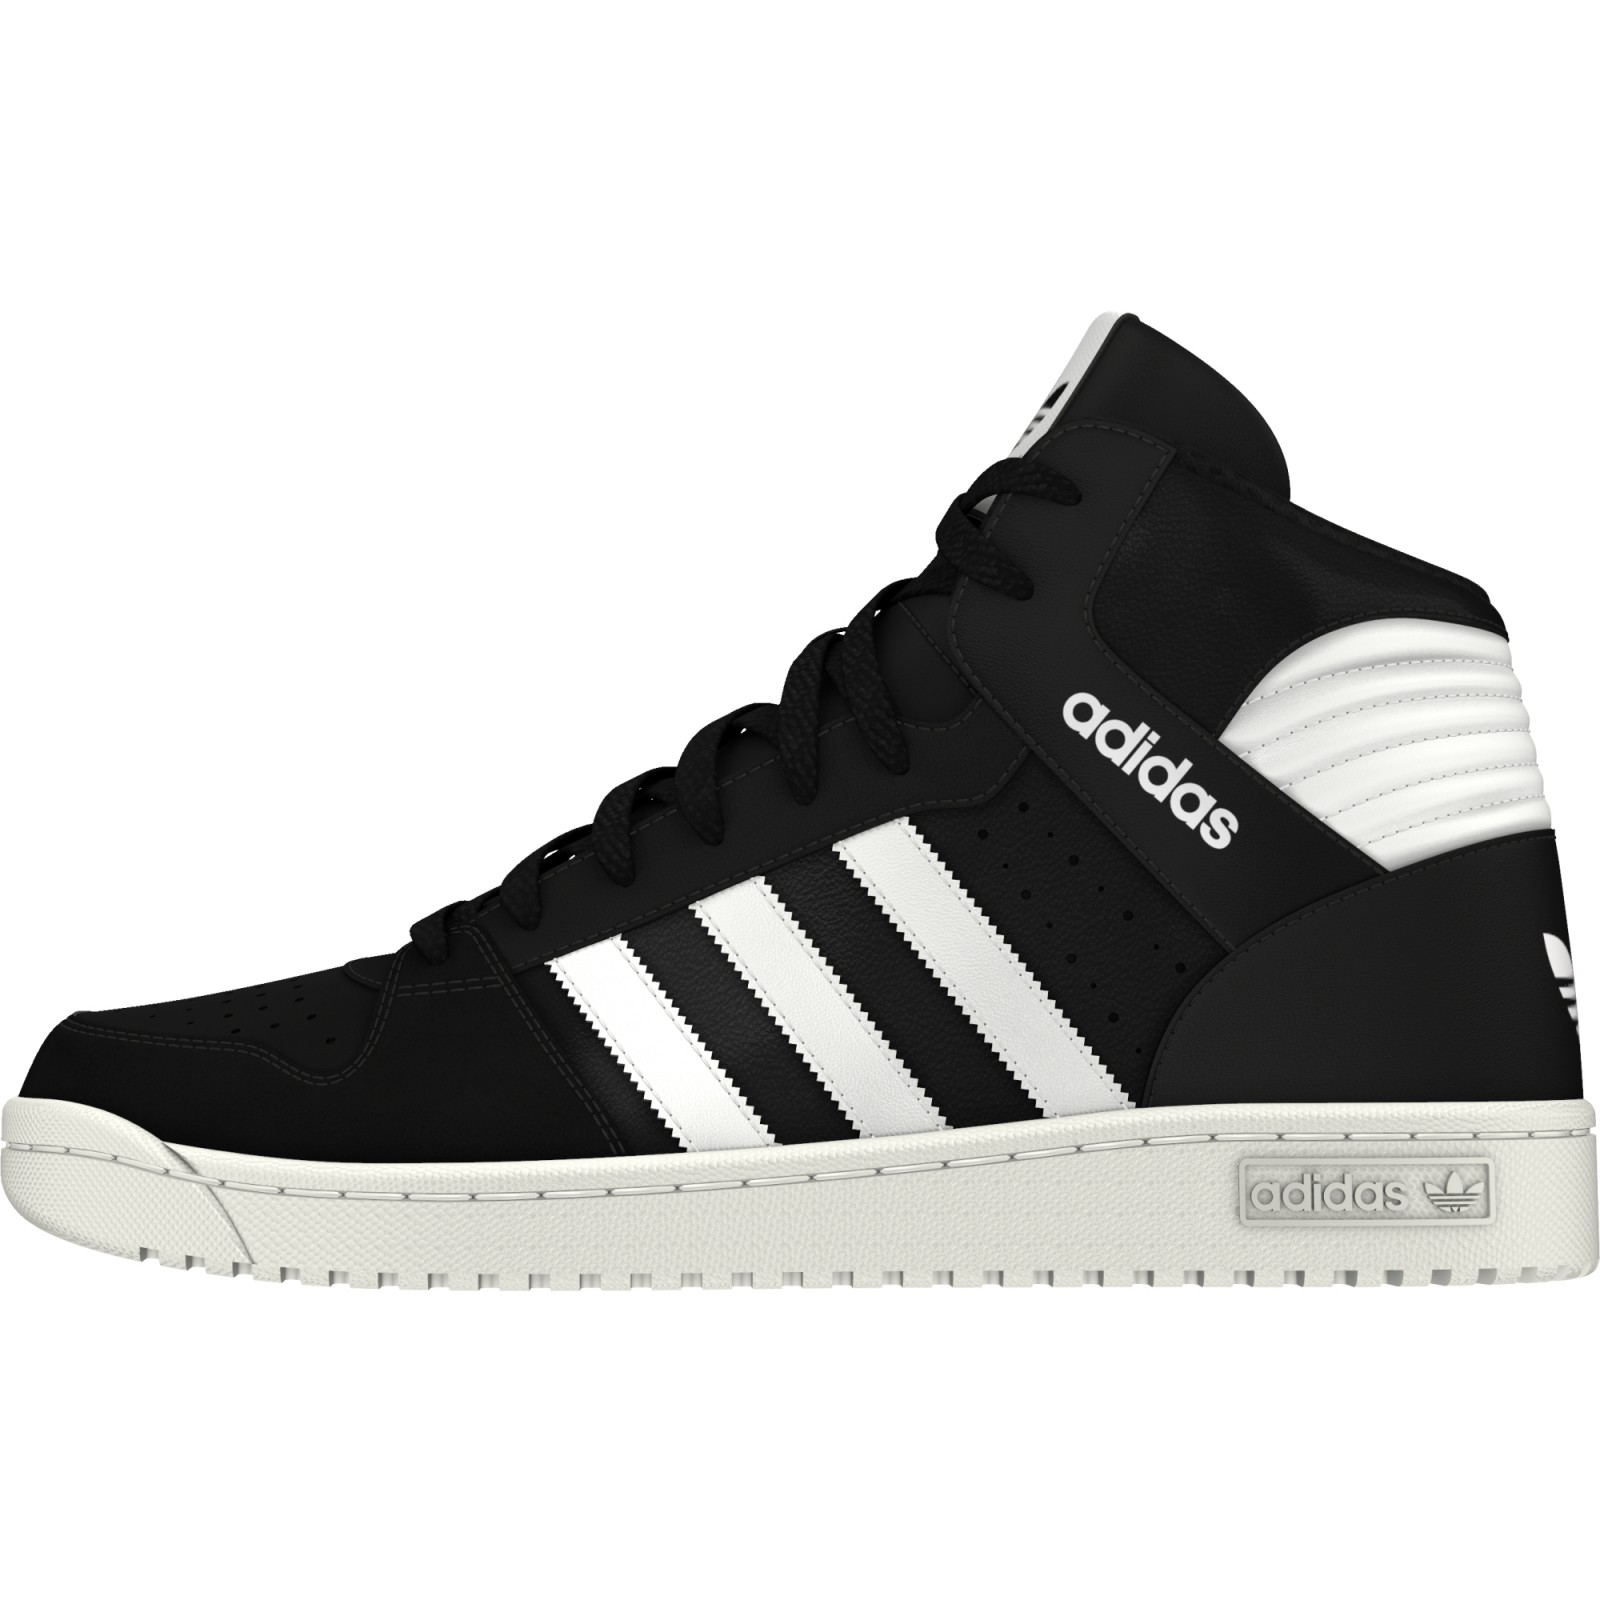 Pánské tenisky adidas PRO PLAY 2  be52863ef50